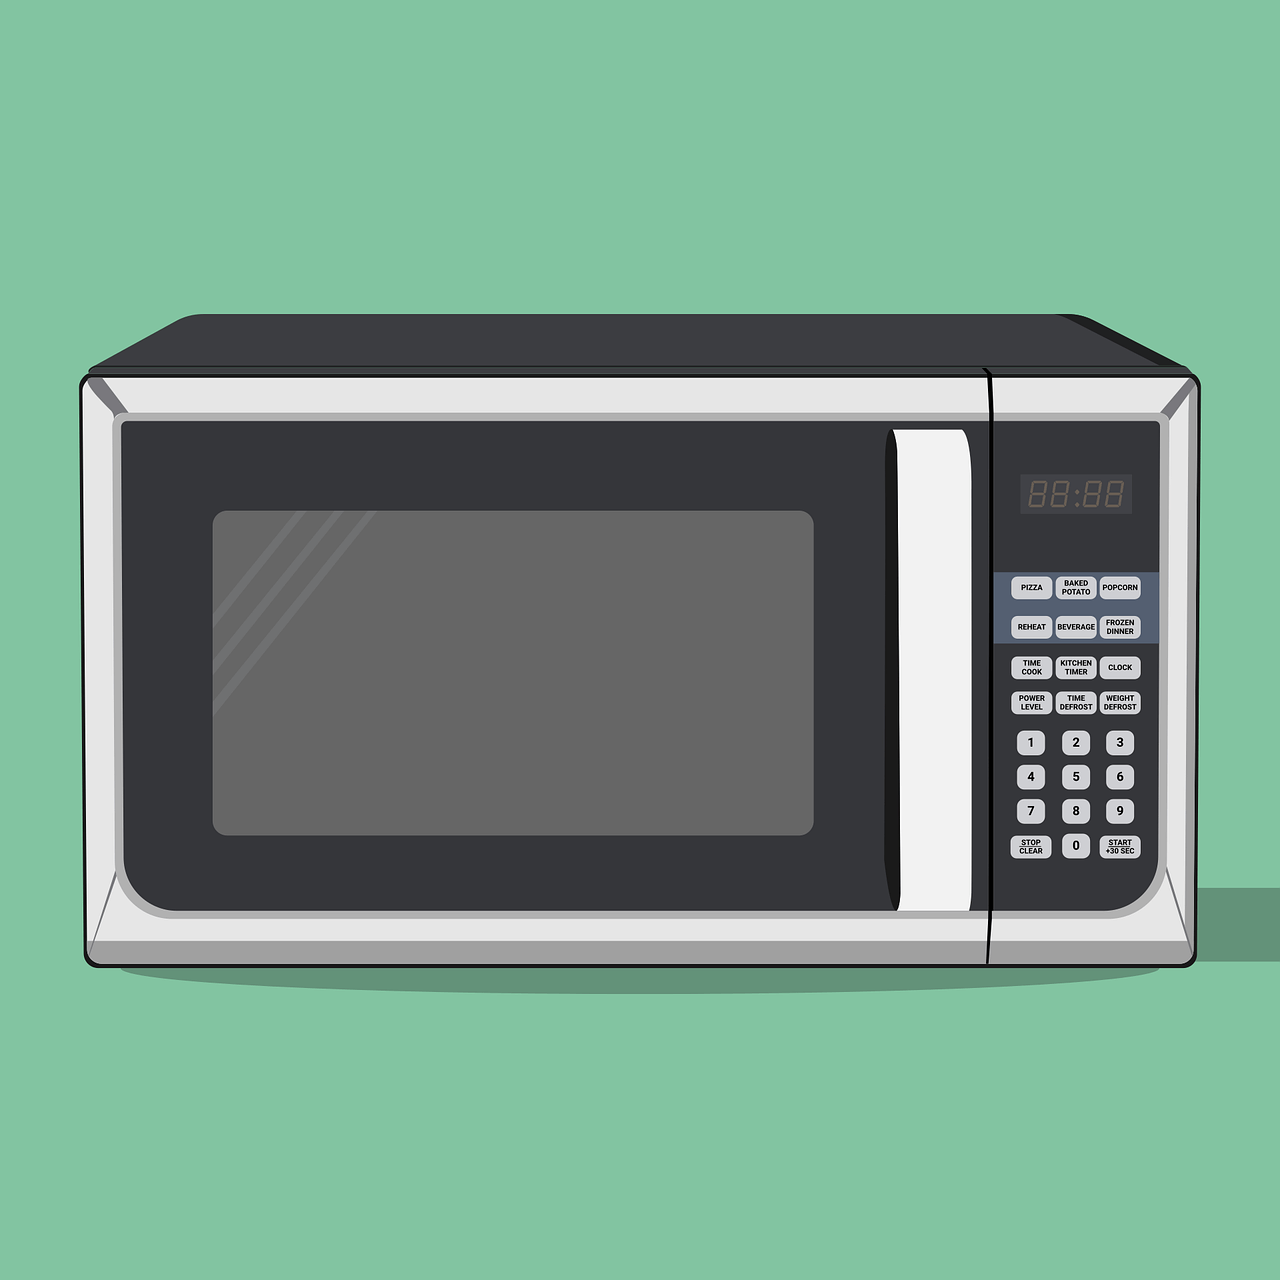 Cover-Food-In-Microwaves